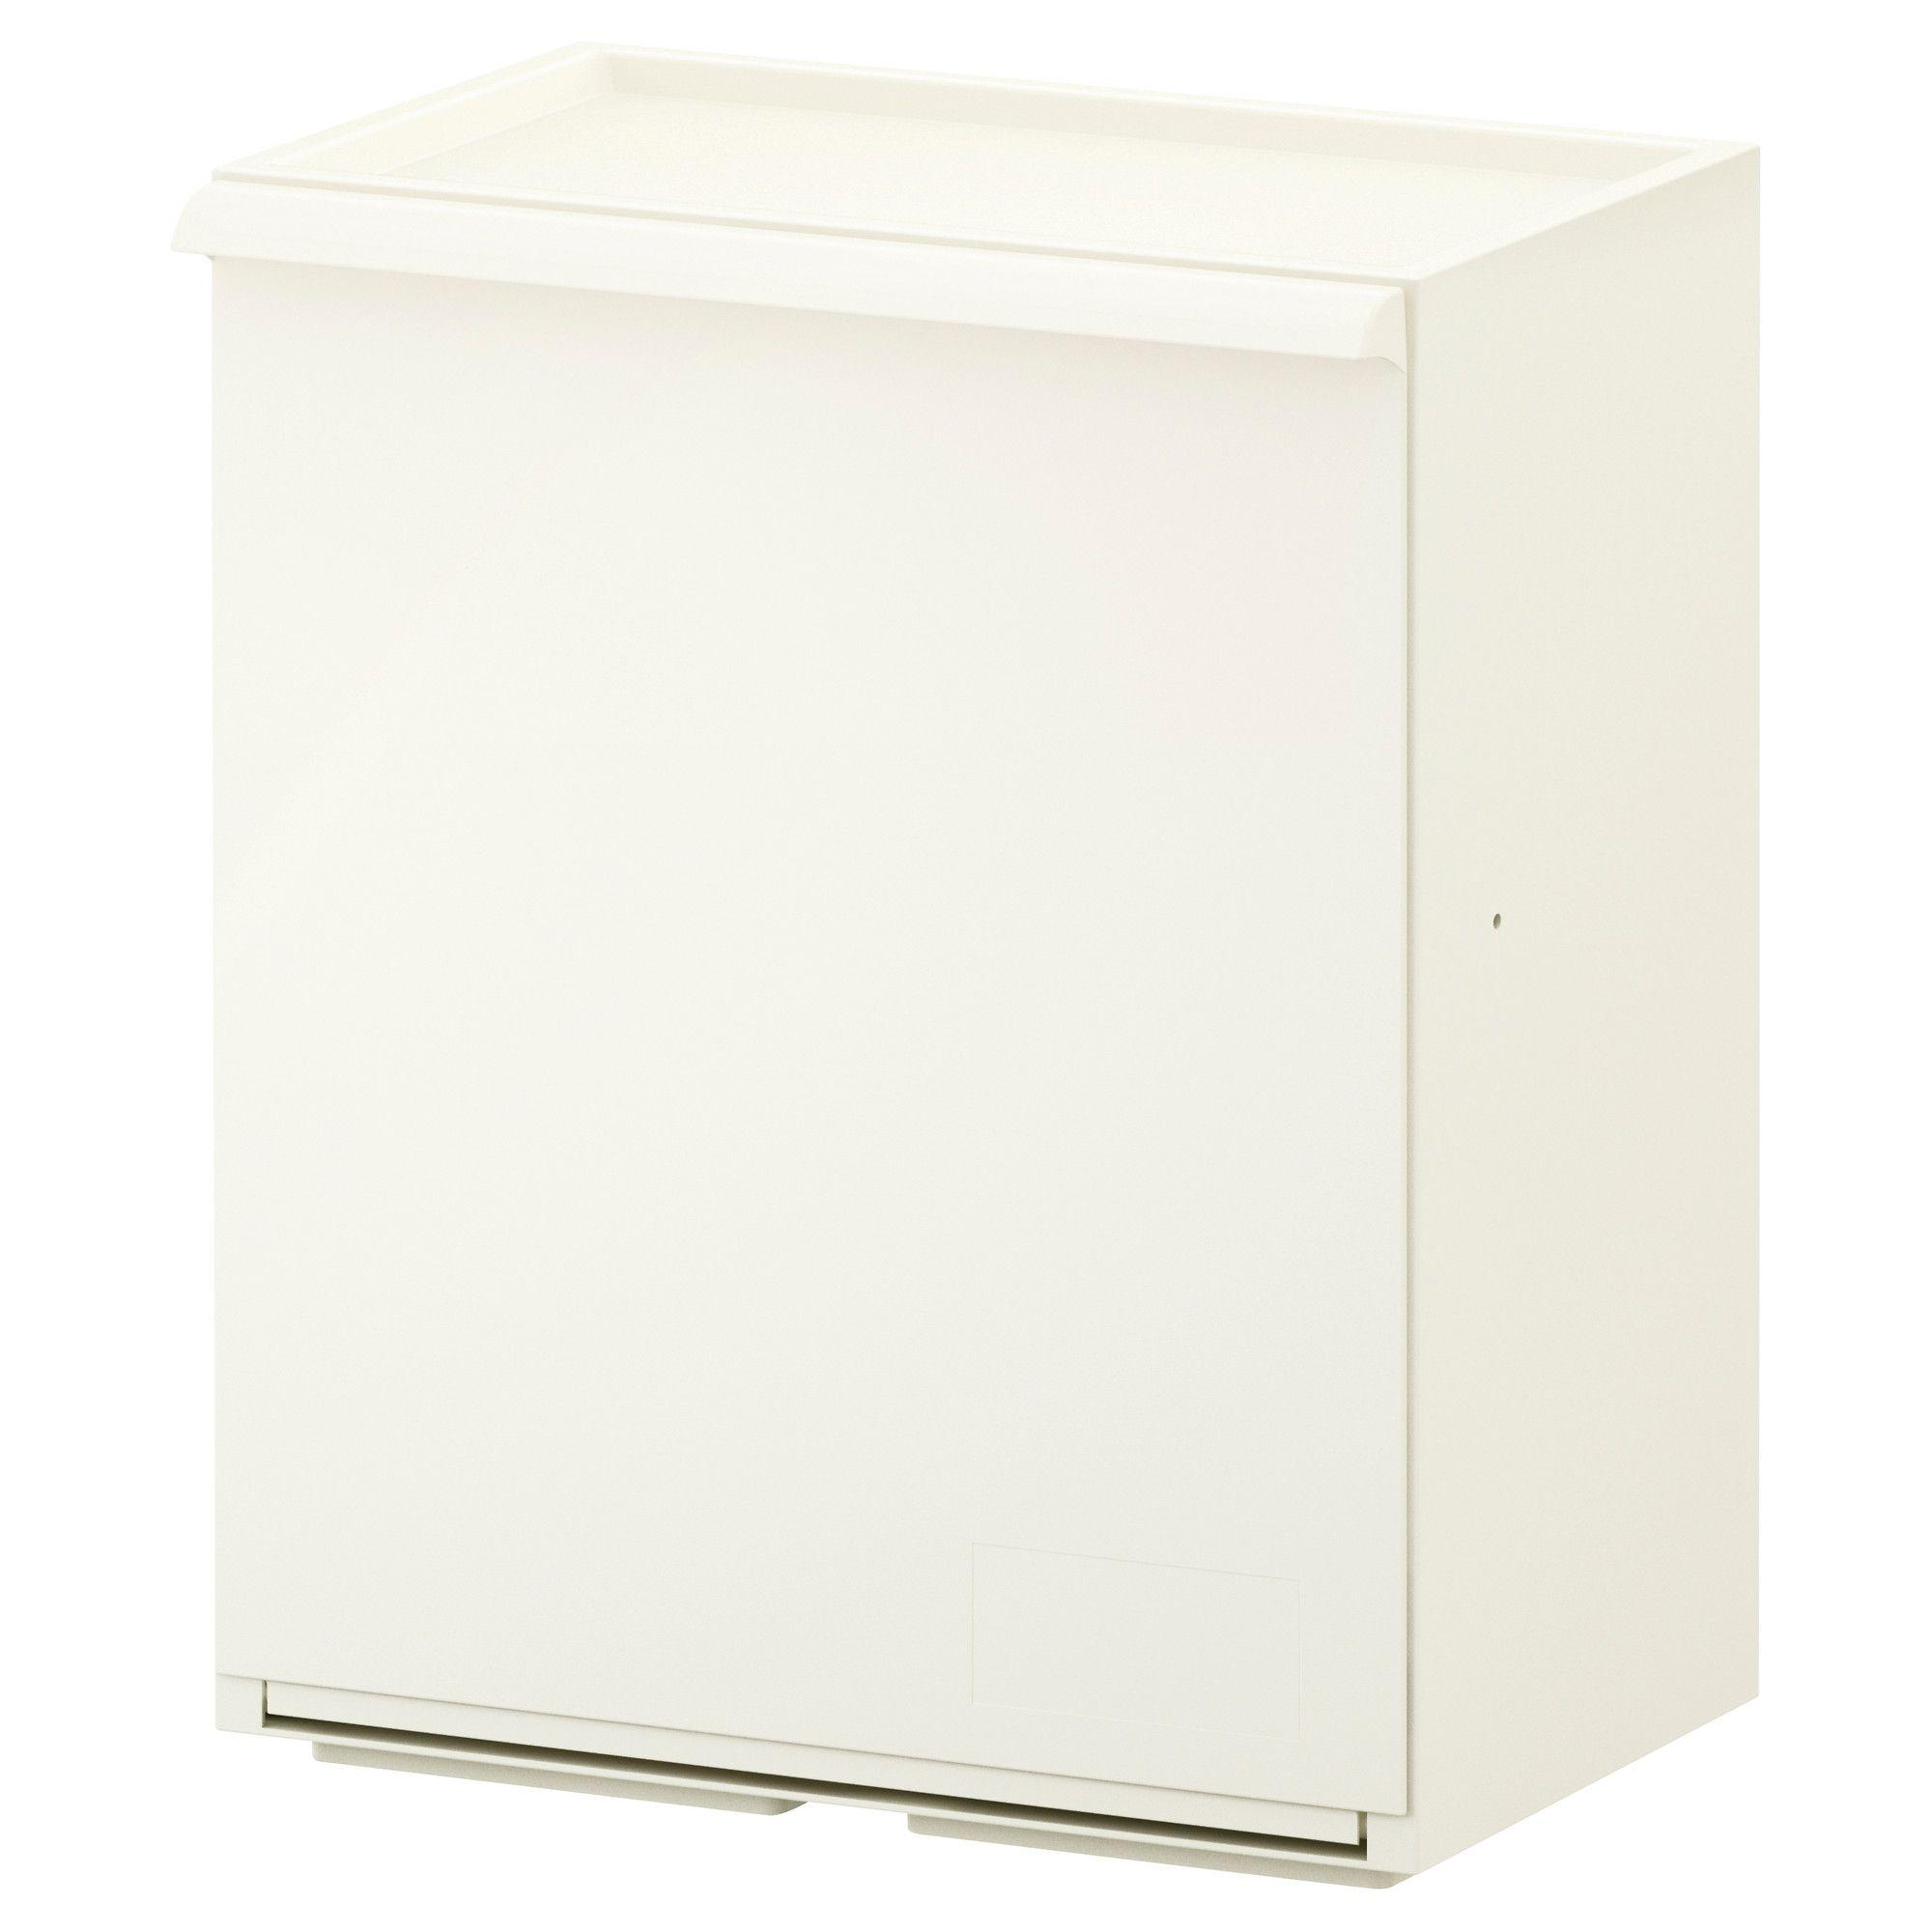 RETUR Recycling Bin   IKEA For Bathroom Cleaner Storage